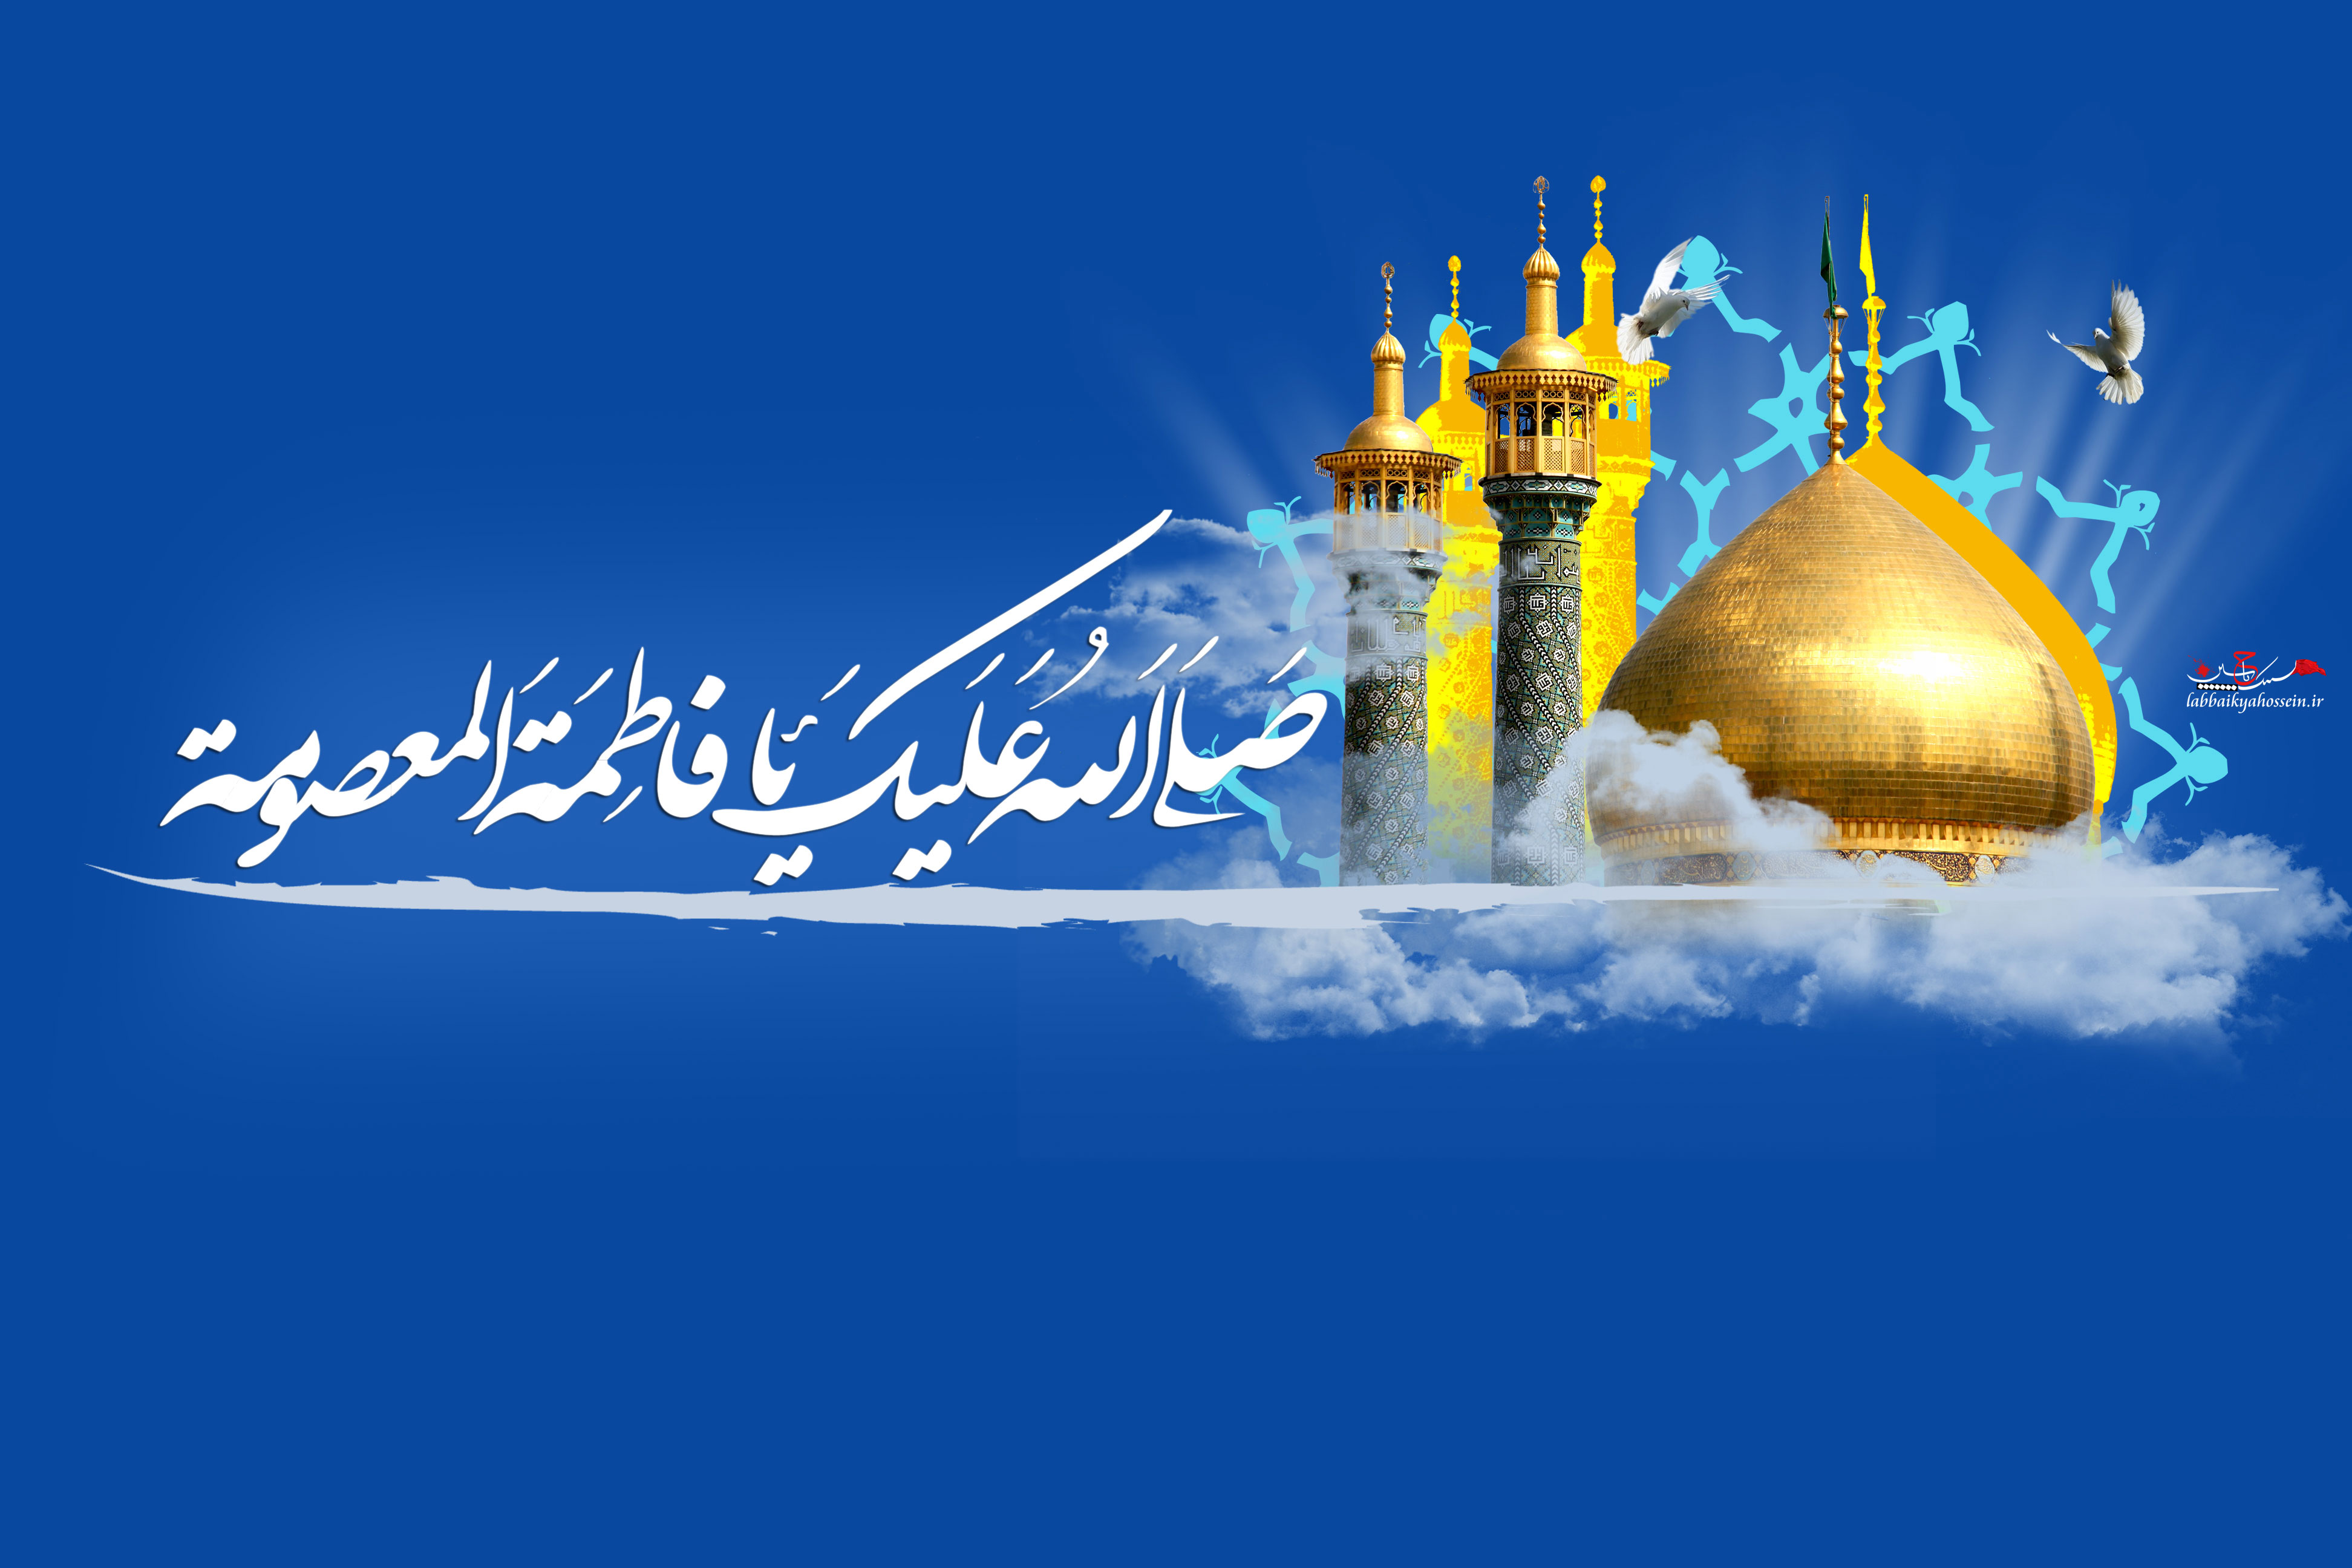 بانو! تمام ایران خاک زیرپایت